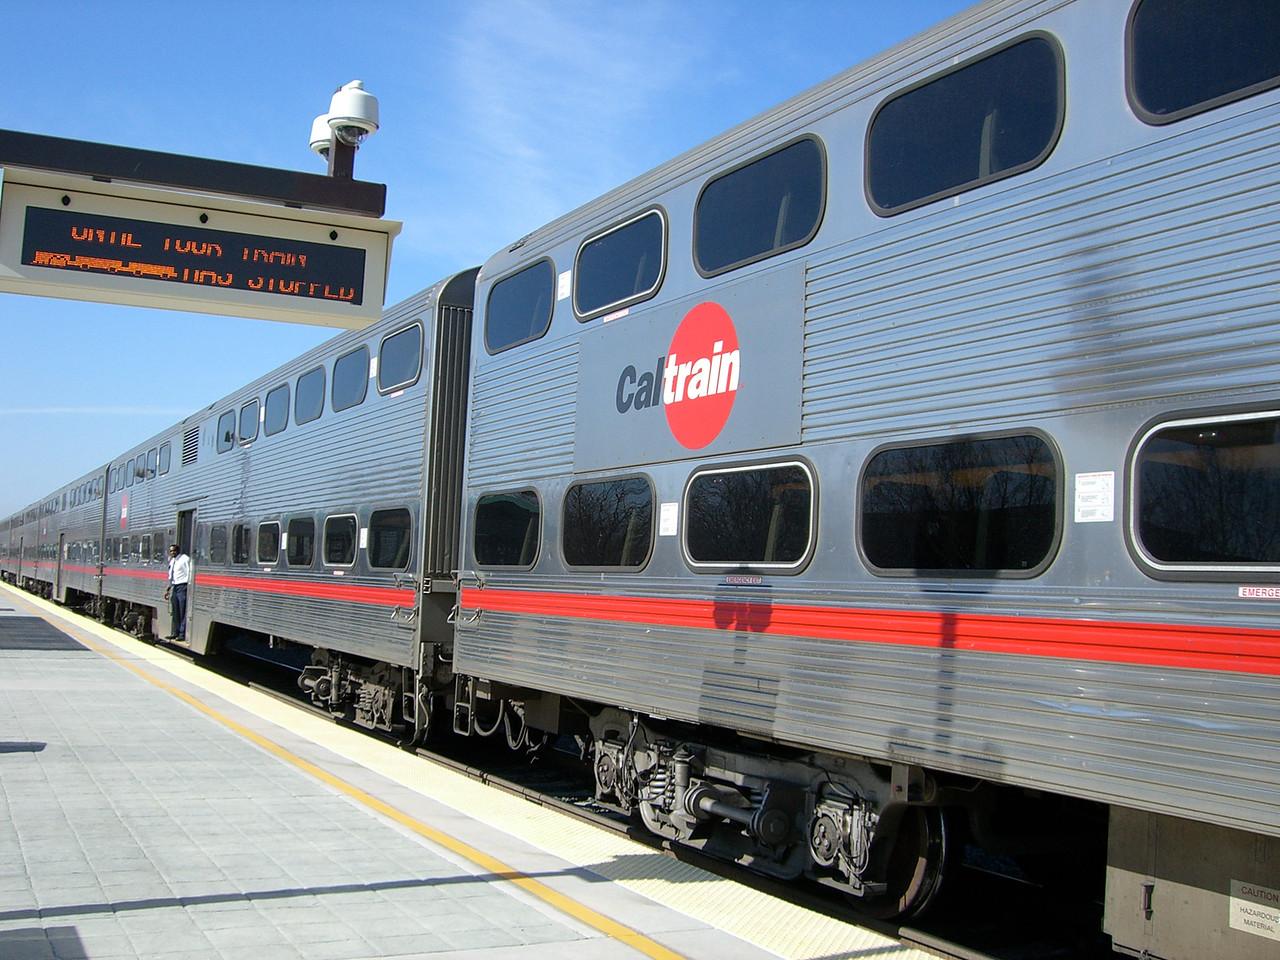 2006 02 24 Fri - CalTrain - Old romance of trains